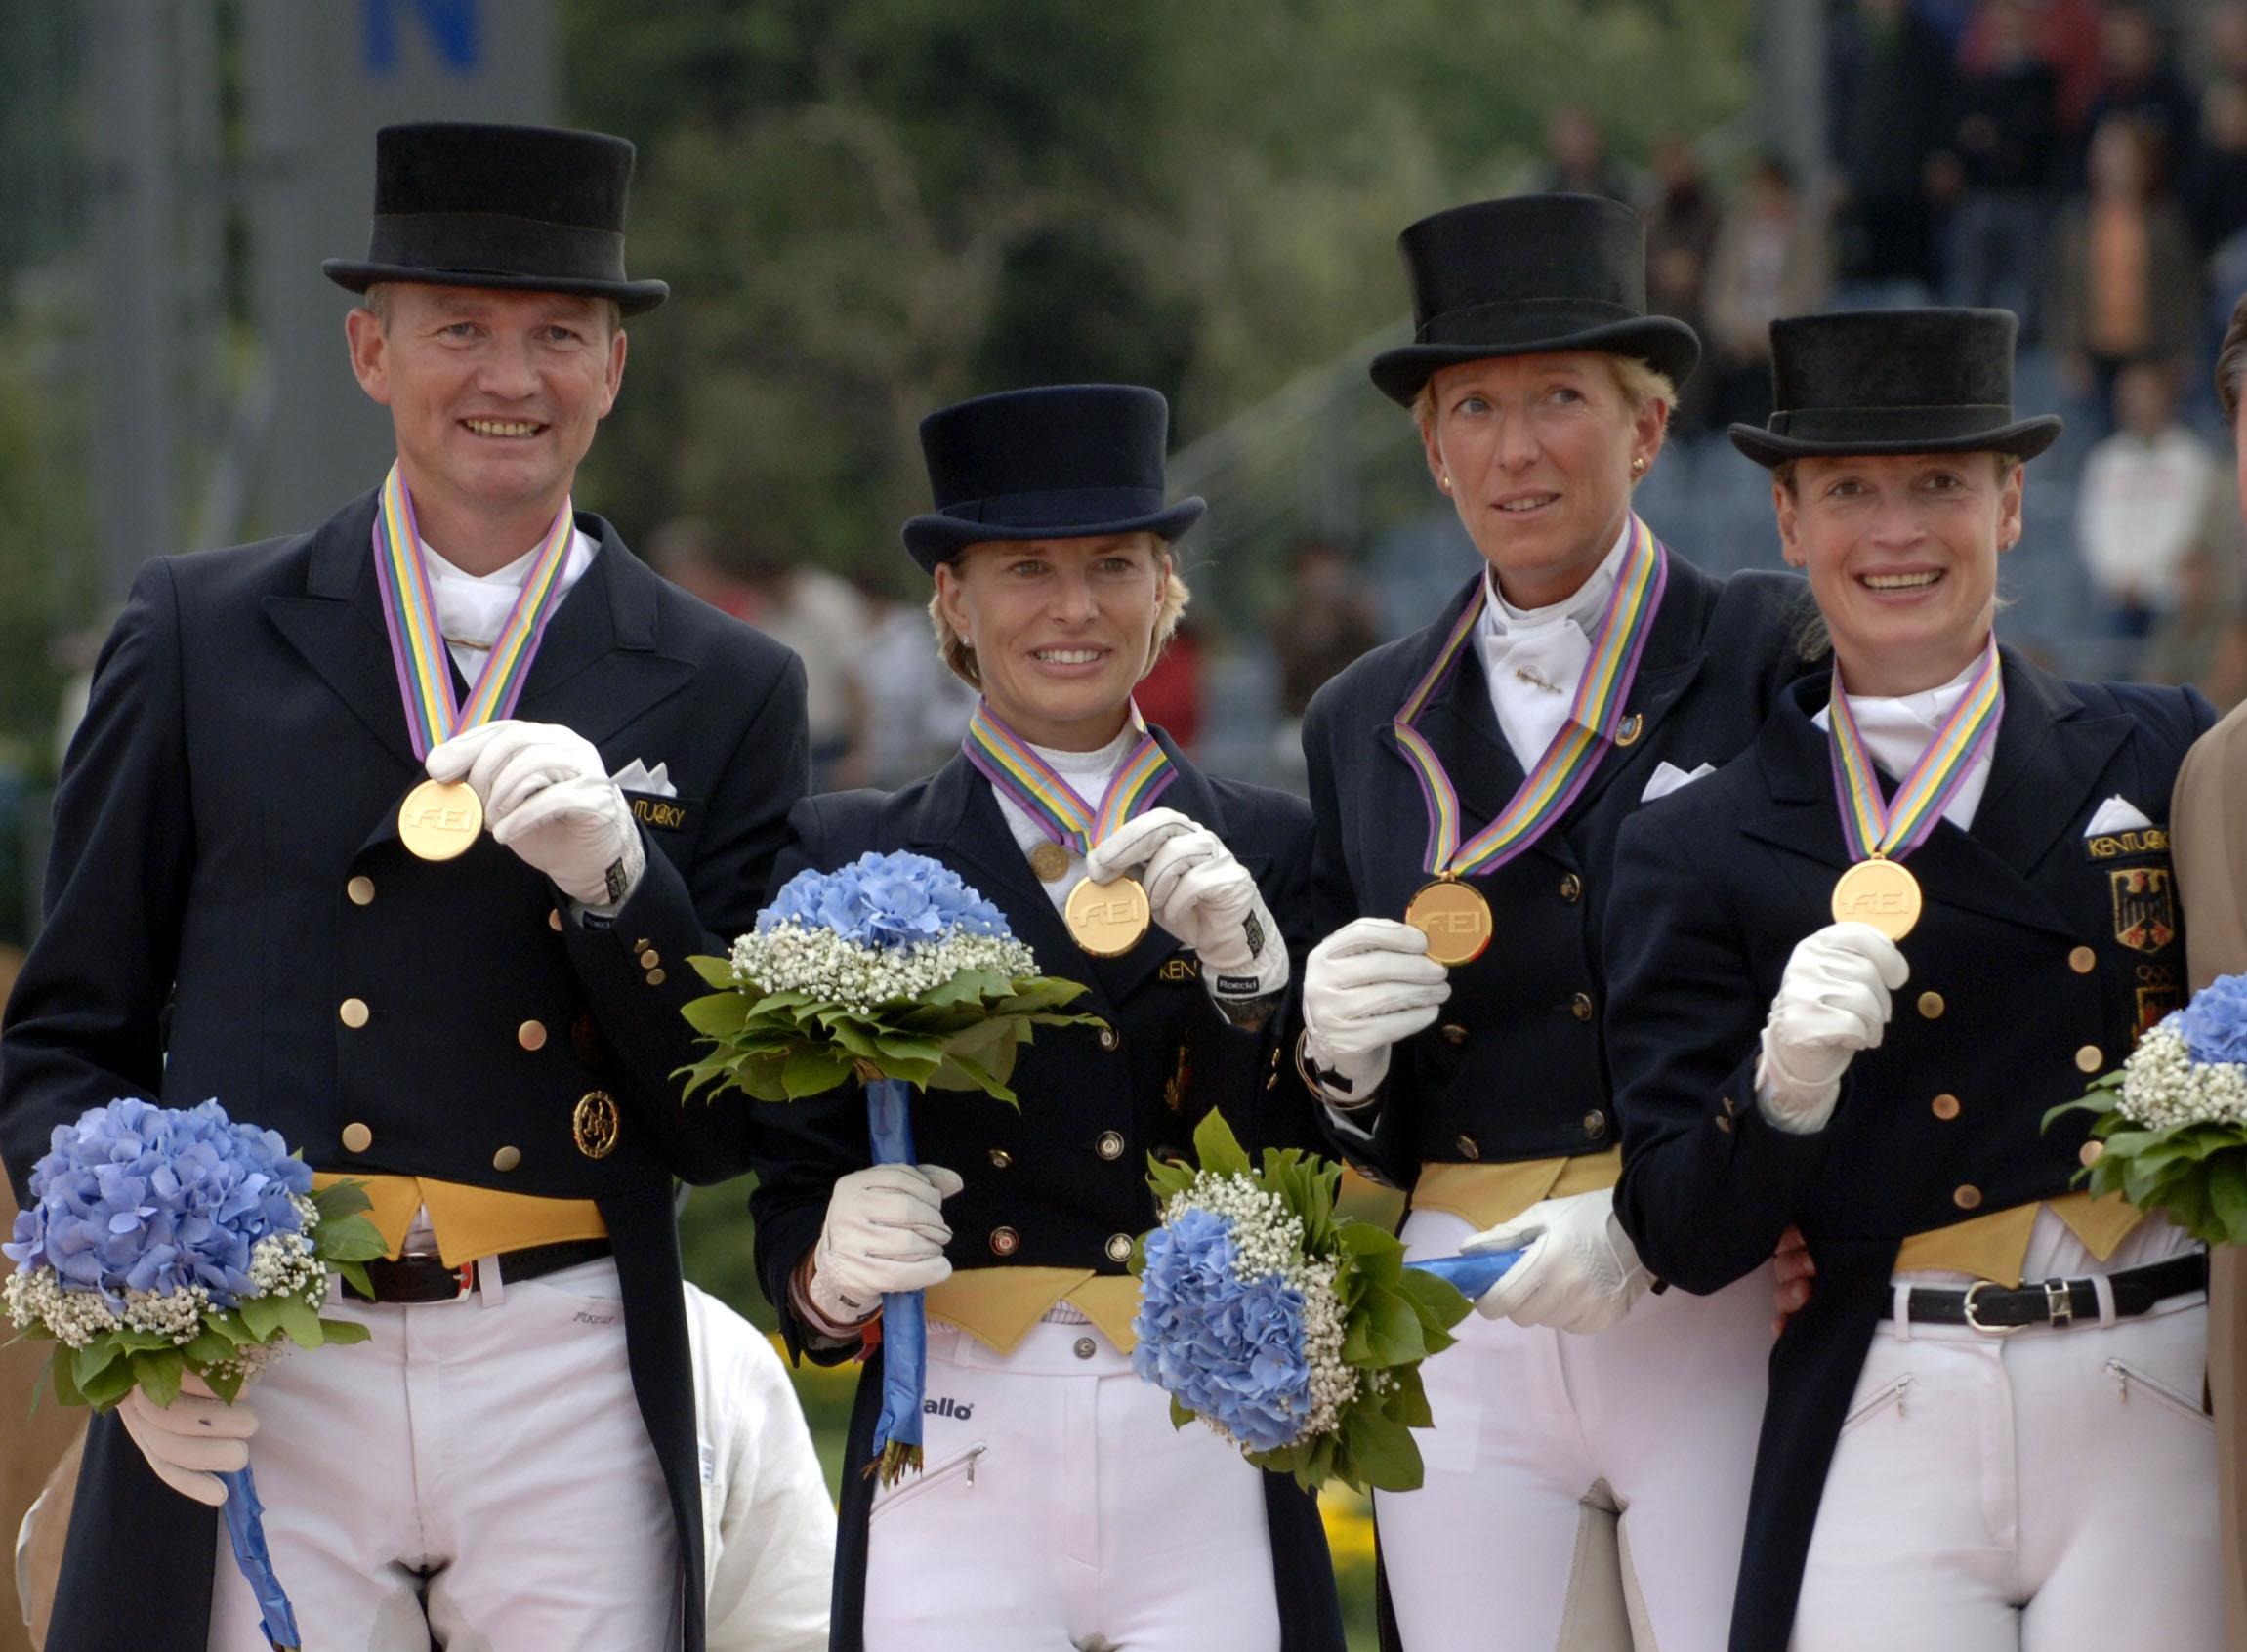 Hubertus Schmidt, Nadine Capellmann, Heike Kemmer, Isabell Werth, VM 2006 Aachen